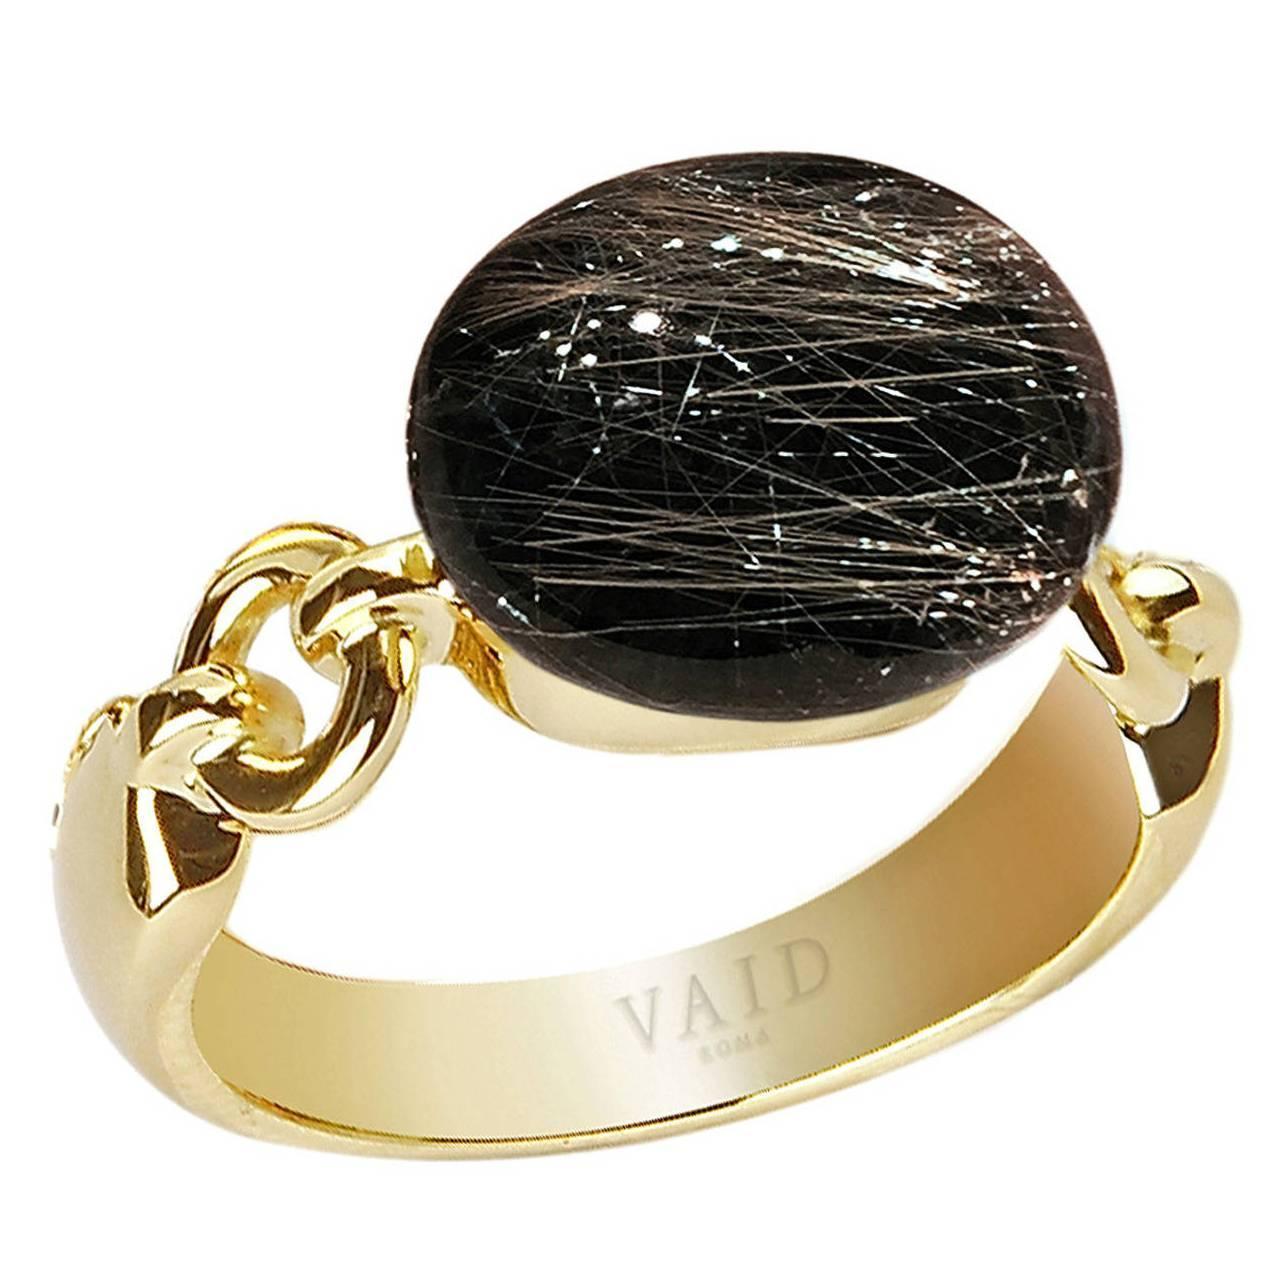 Golden Rutilated Quartz Jewelry Of Vaid Roma Three Dimensional Golden Rutilated Quartz Onyx